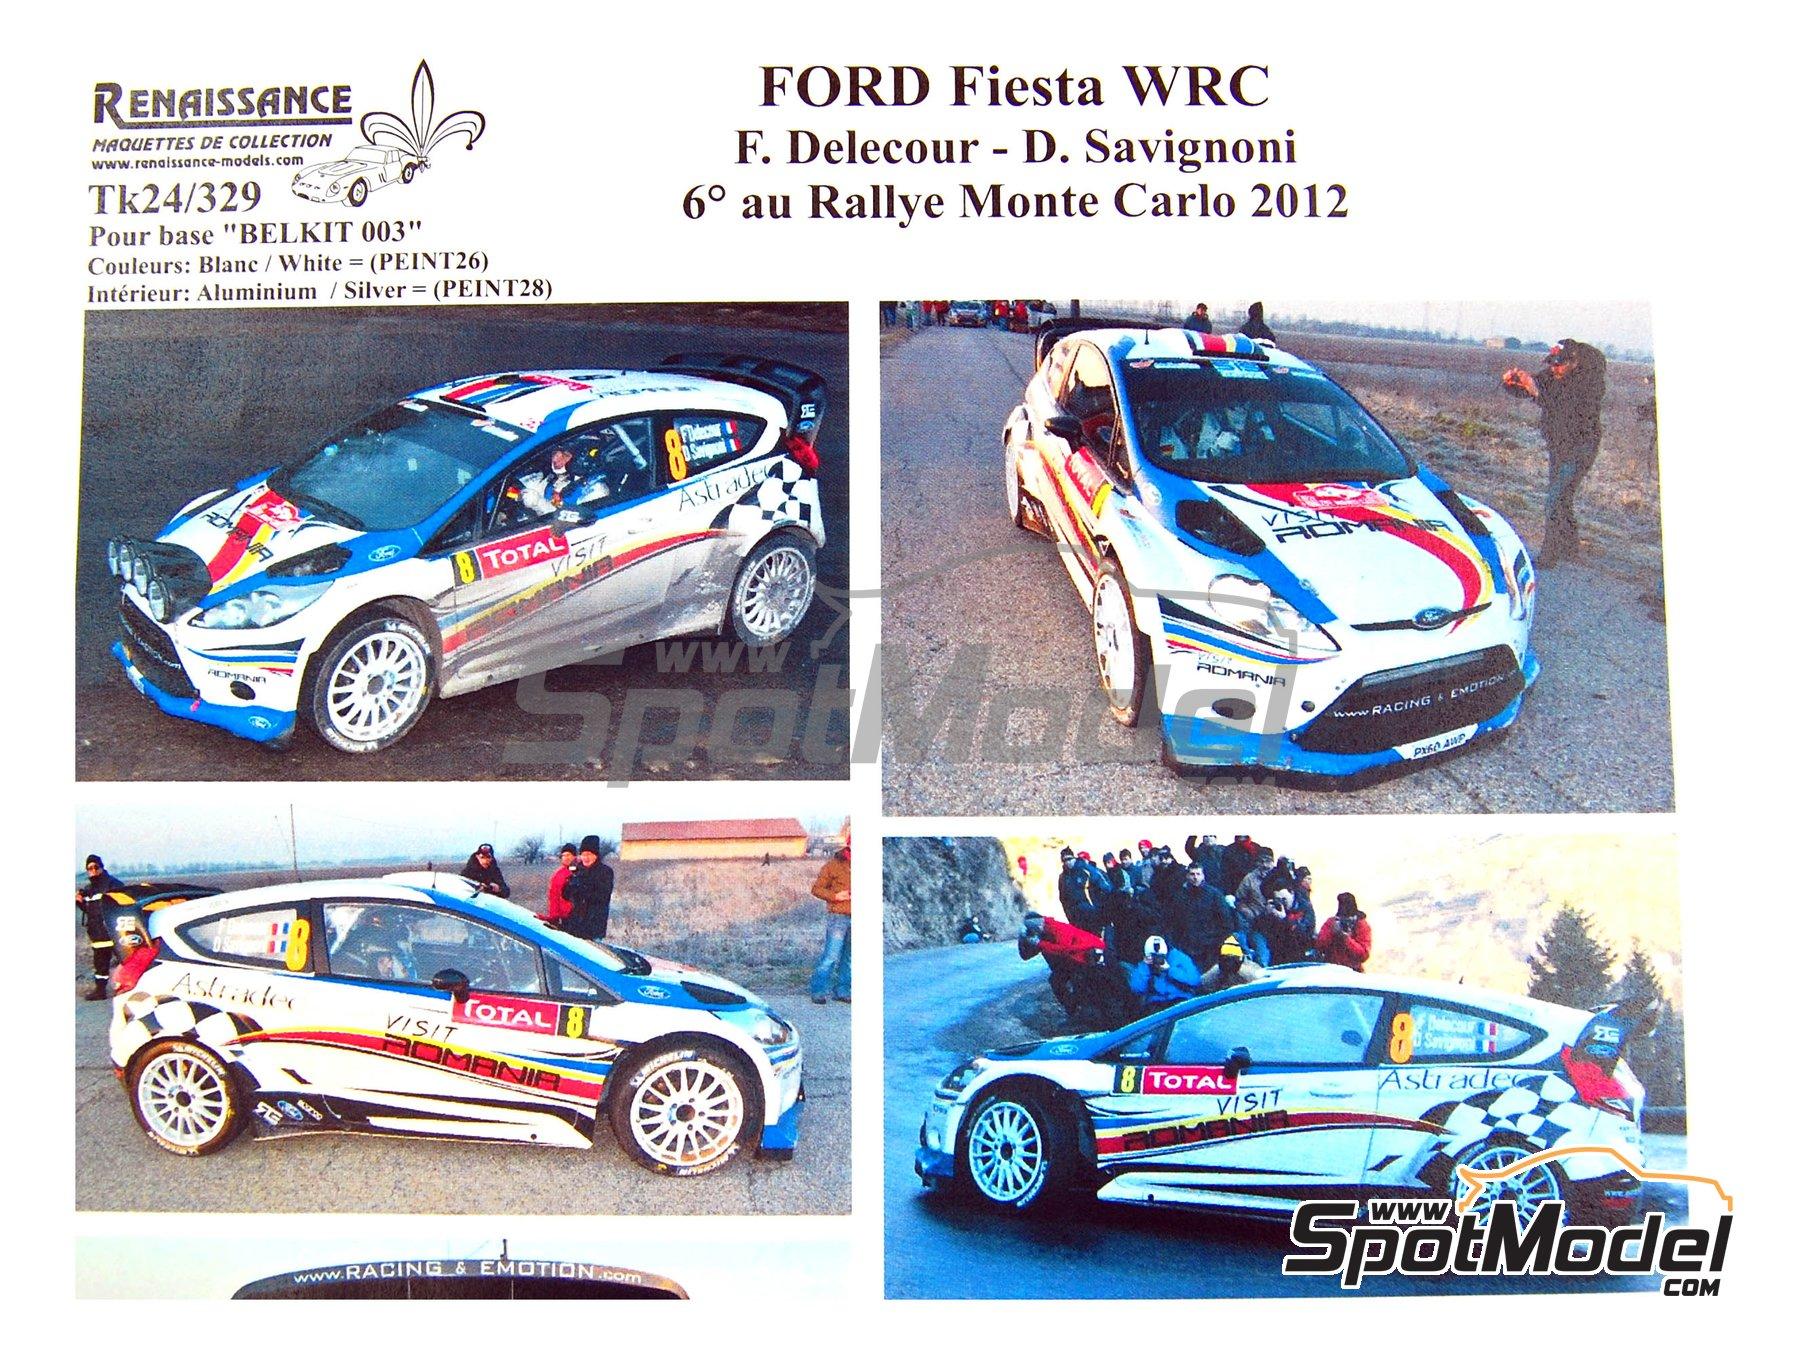 Image 1: Ford Fiesta WRC Romania - Rally de Montecarlo 2012 | Calcas de agua en escala1/24 fabricado por Renaissance Models (ref.TK24-329)